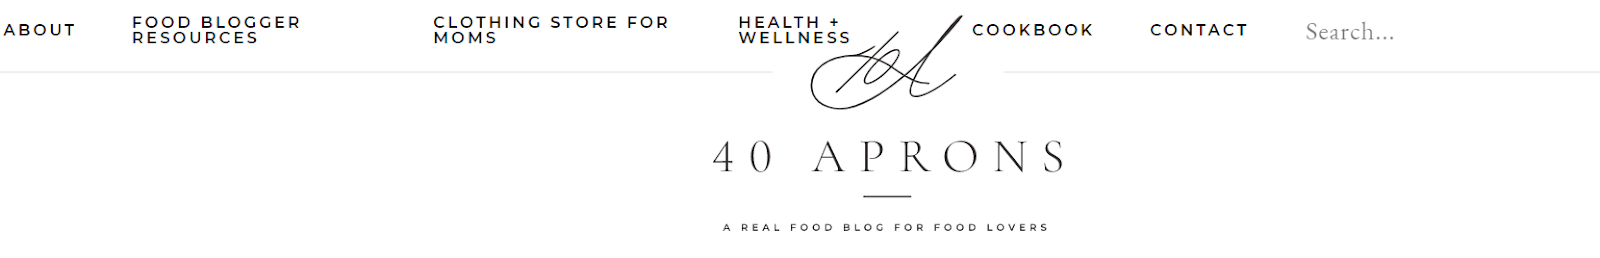 40 Aprons Food Blog